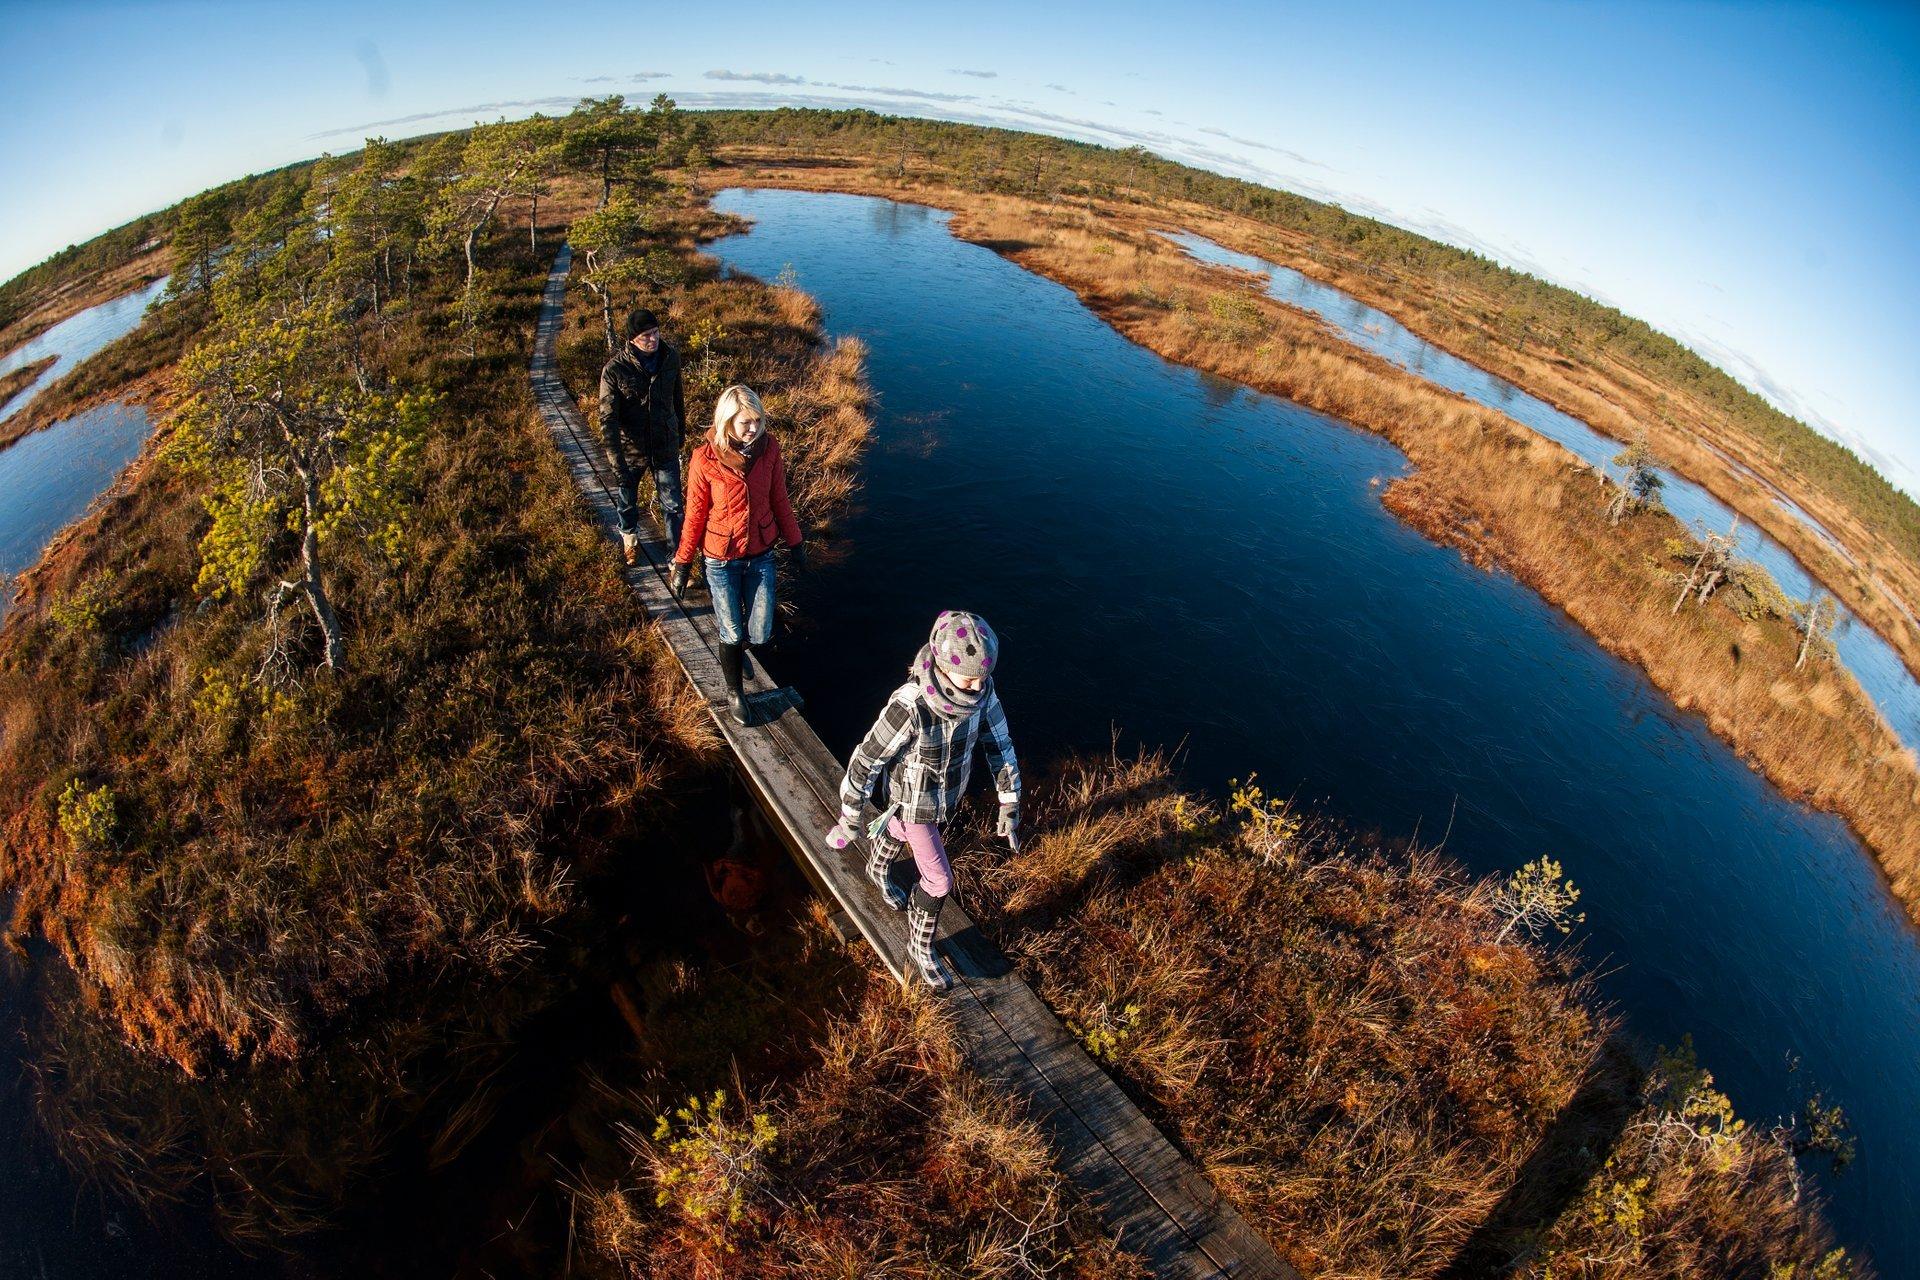 Bog Walking in Estonia 2020 - Best Time